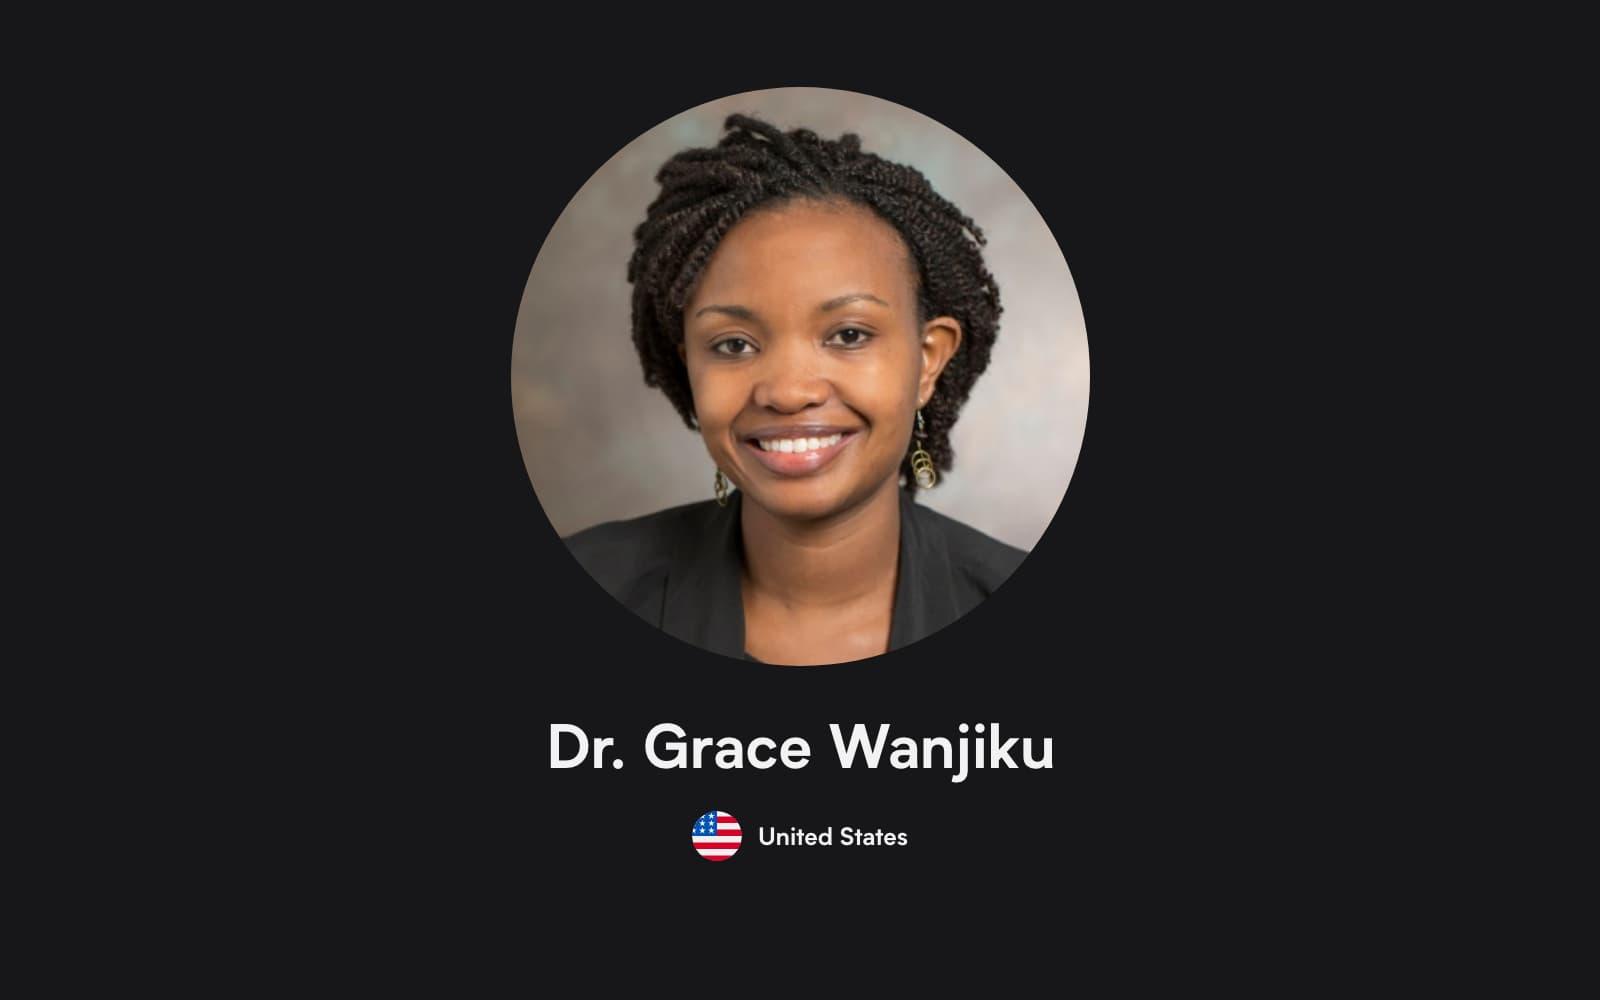 Portrait of Grace Wanjiku